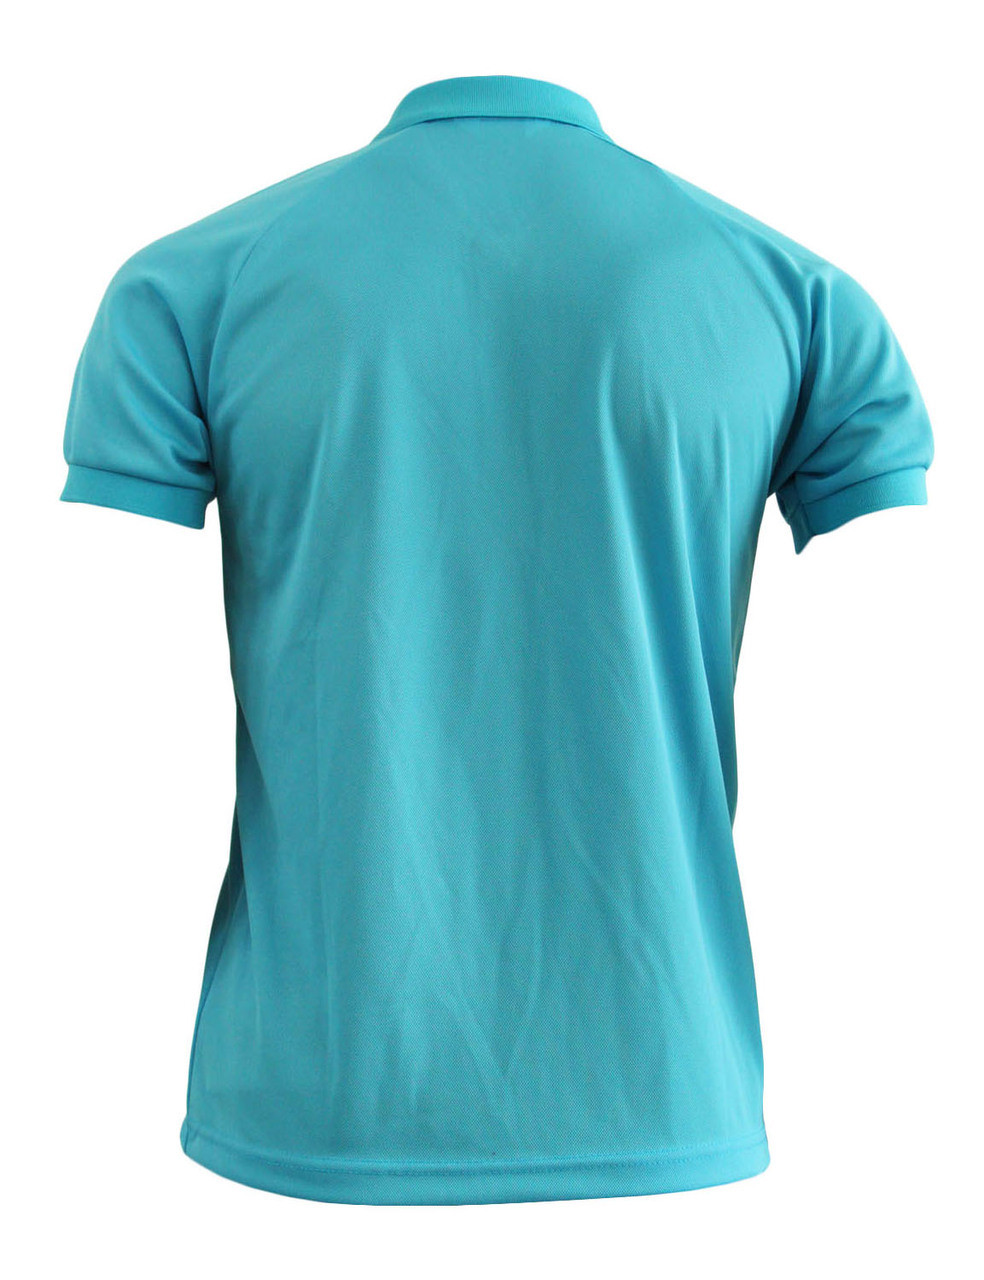 bcfc5ba5 Graphics Design Polo Shirt Sky blue Golfwear Short Sleeve Summer ...